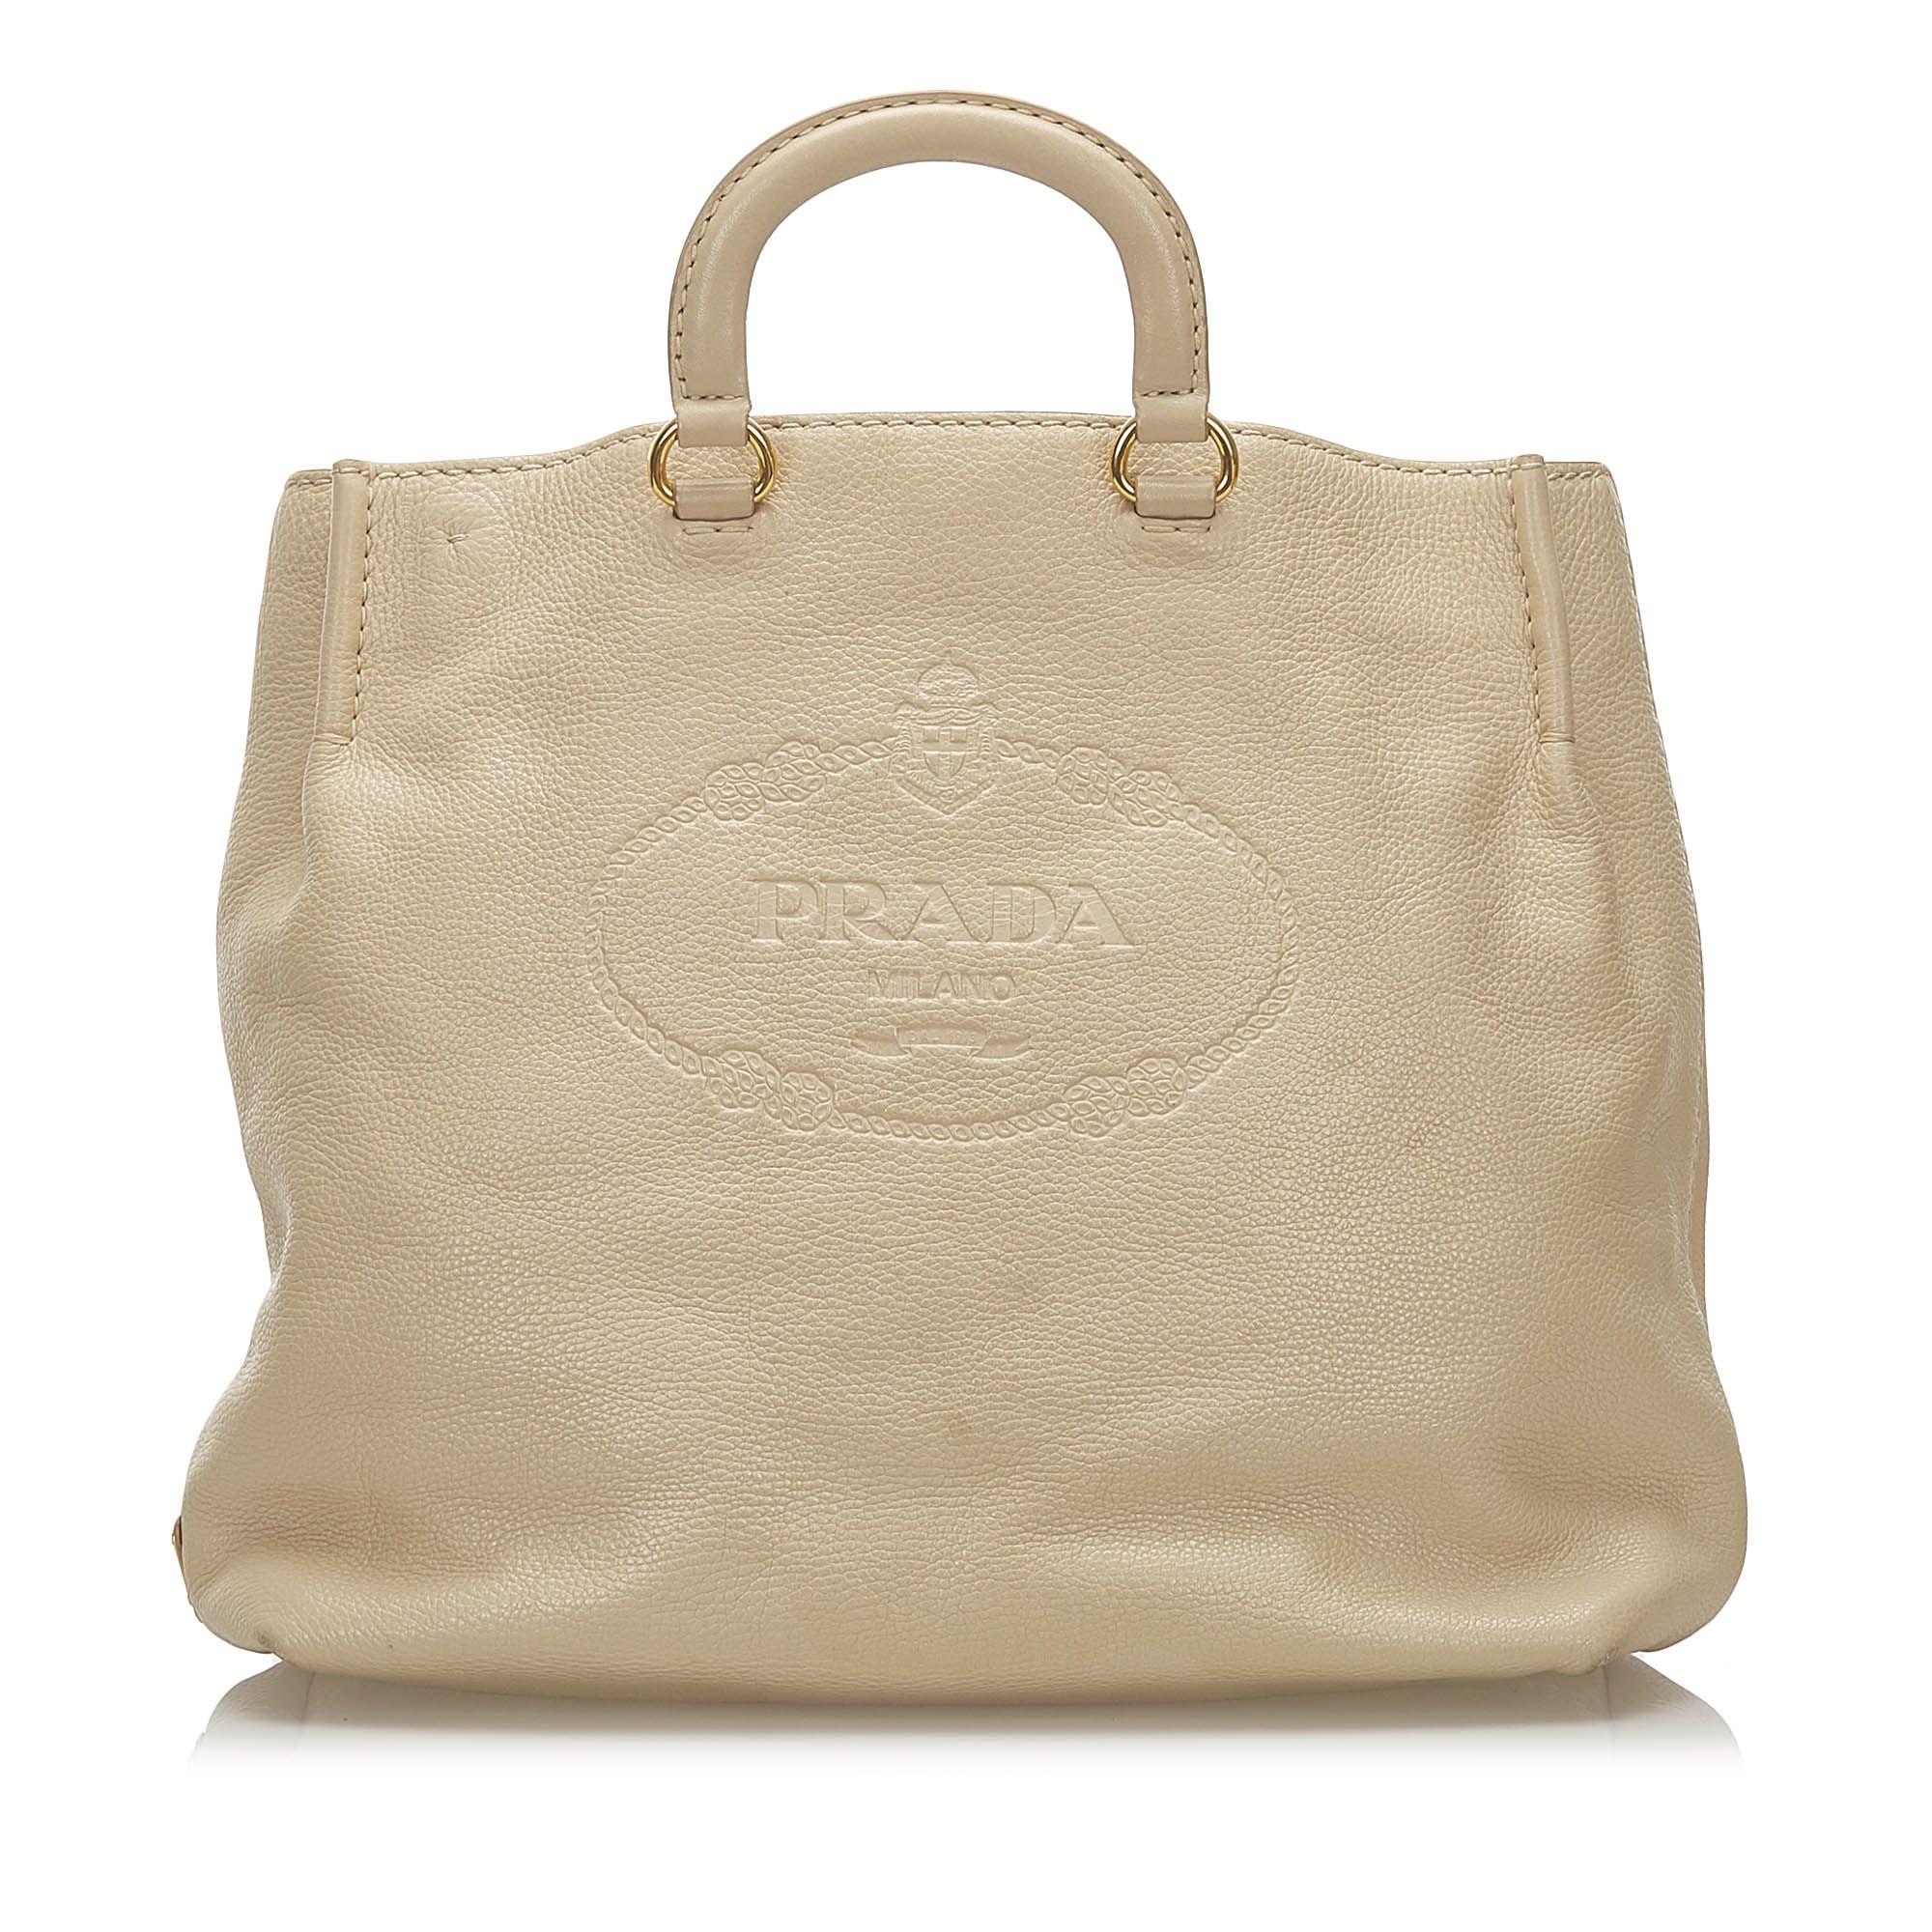 Vintage Prada Logo Leather Satchel Brown